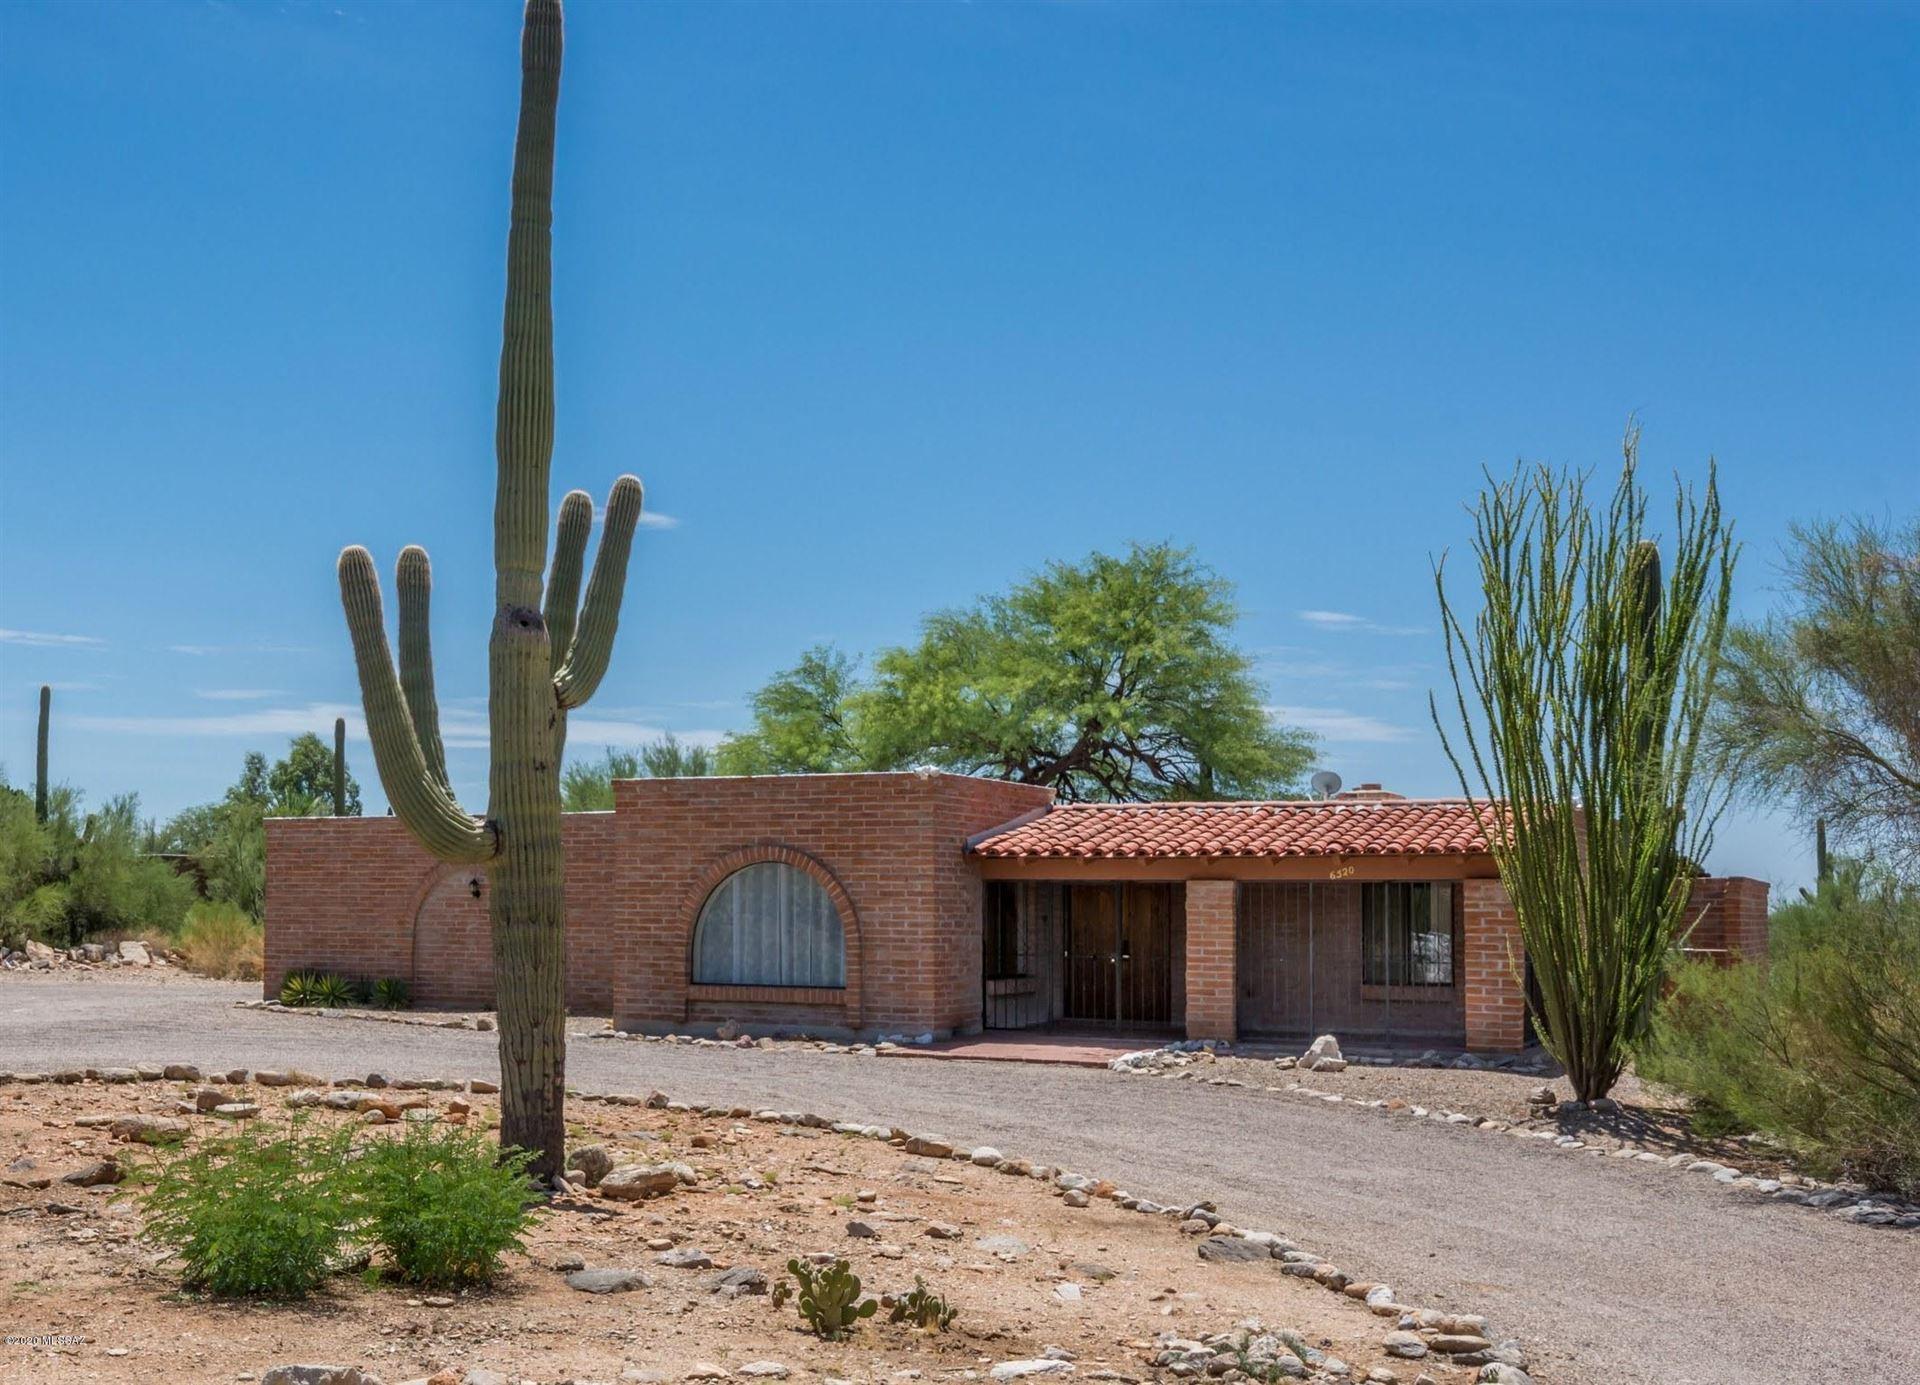 6520 N Altos Tercero, Tucson, AZ 85718 - MLS#: 22020786